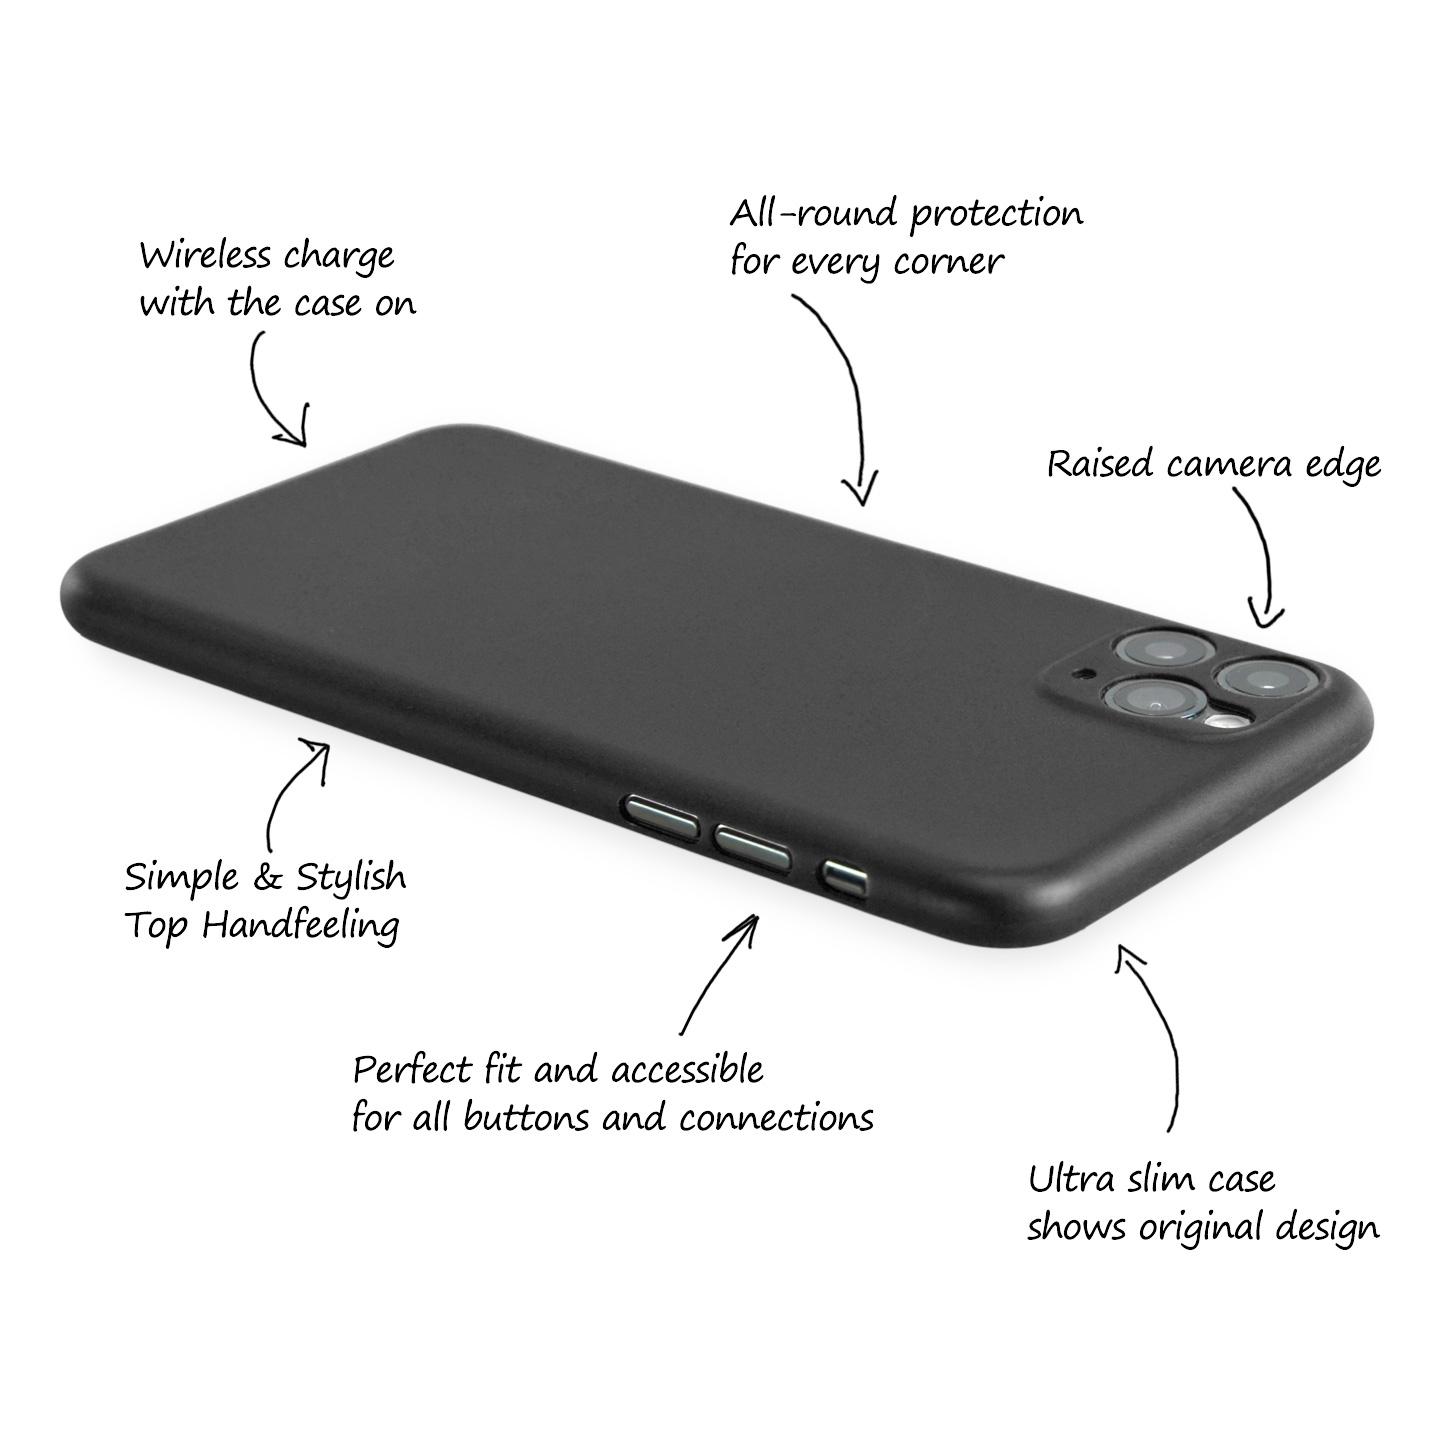 Ultra-Slim-Case-iPhone-11-Pro-5-8-034-Matt-Clear-Schutz-Huelle-Skin-Cover-Etui-Folie Indexbild 6